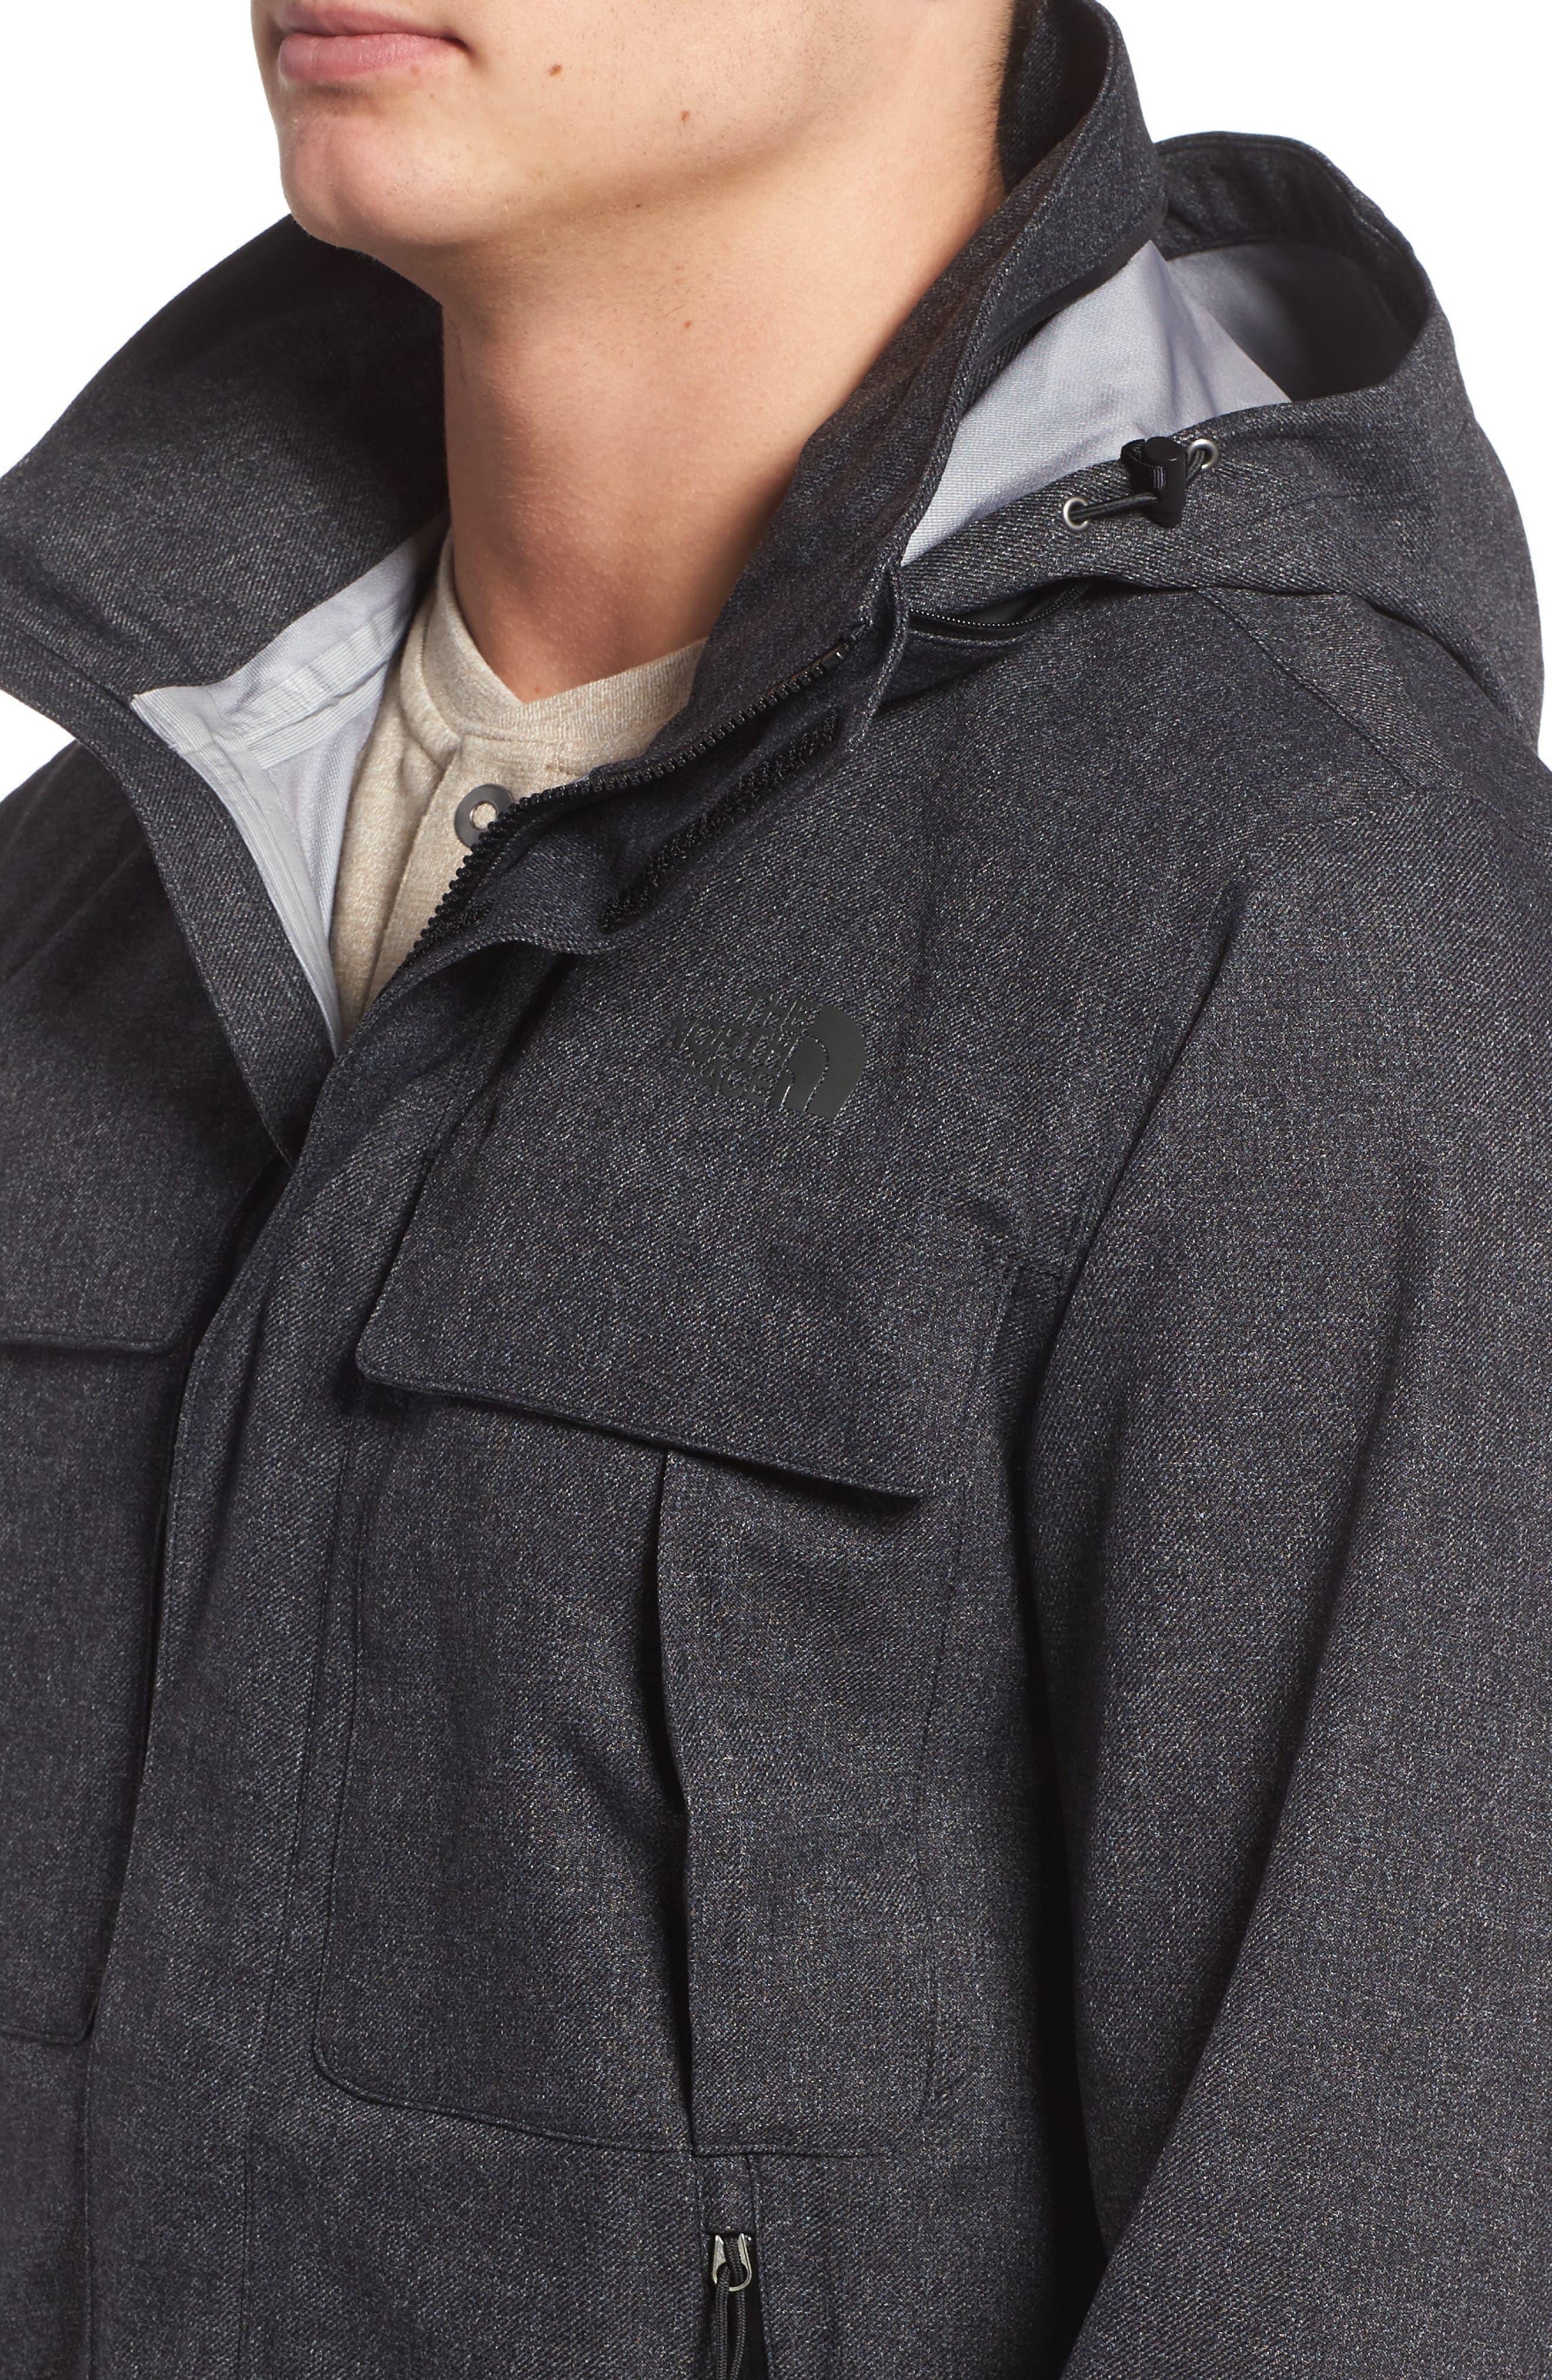 Kassler DryVent Field Jacket,                             Alternate thumbnail 4, color,                             001